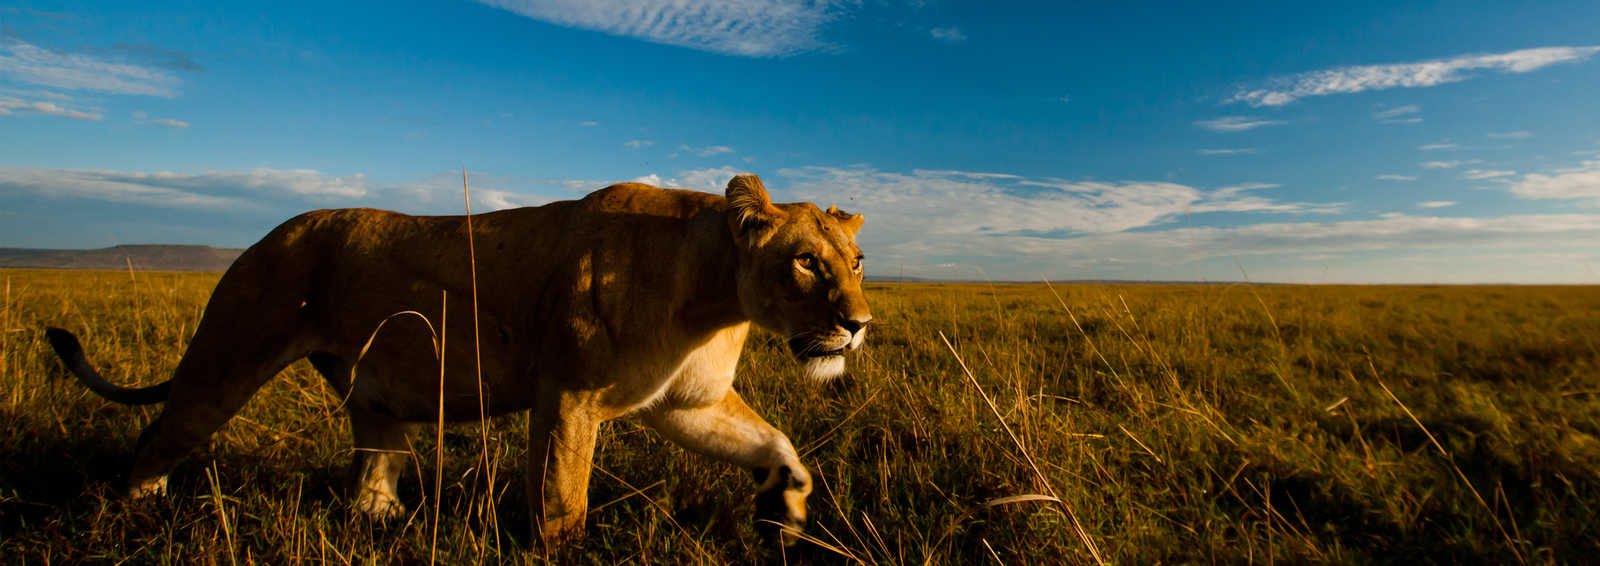 Lion on Safari in Africa